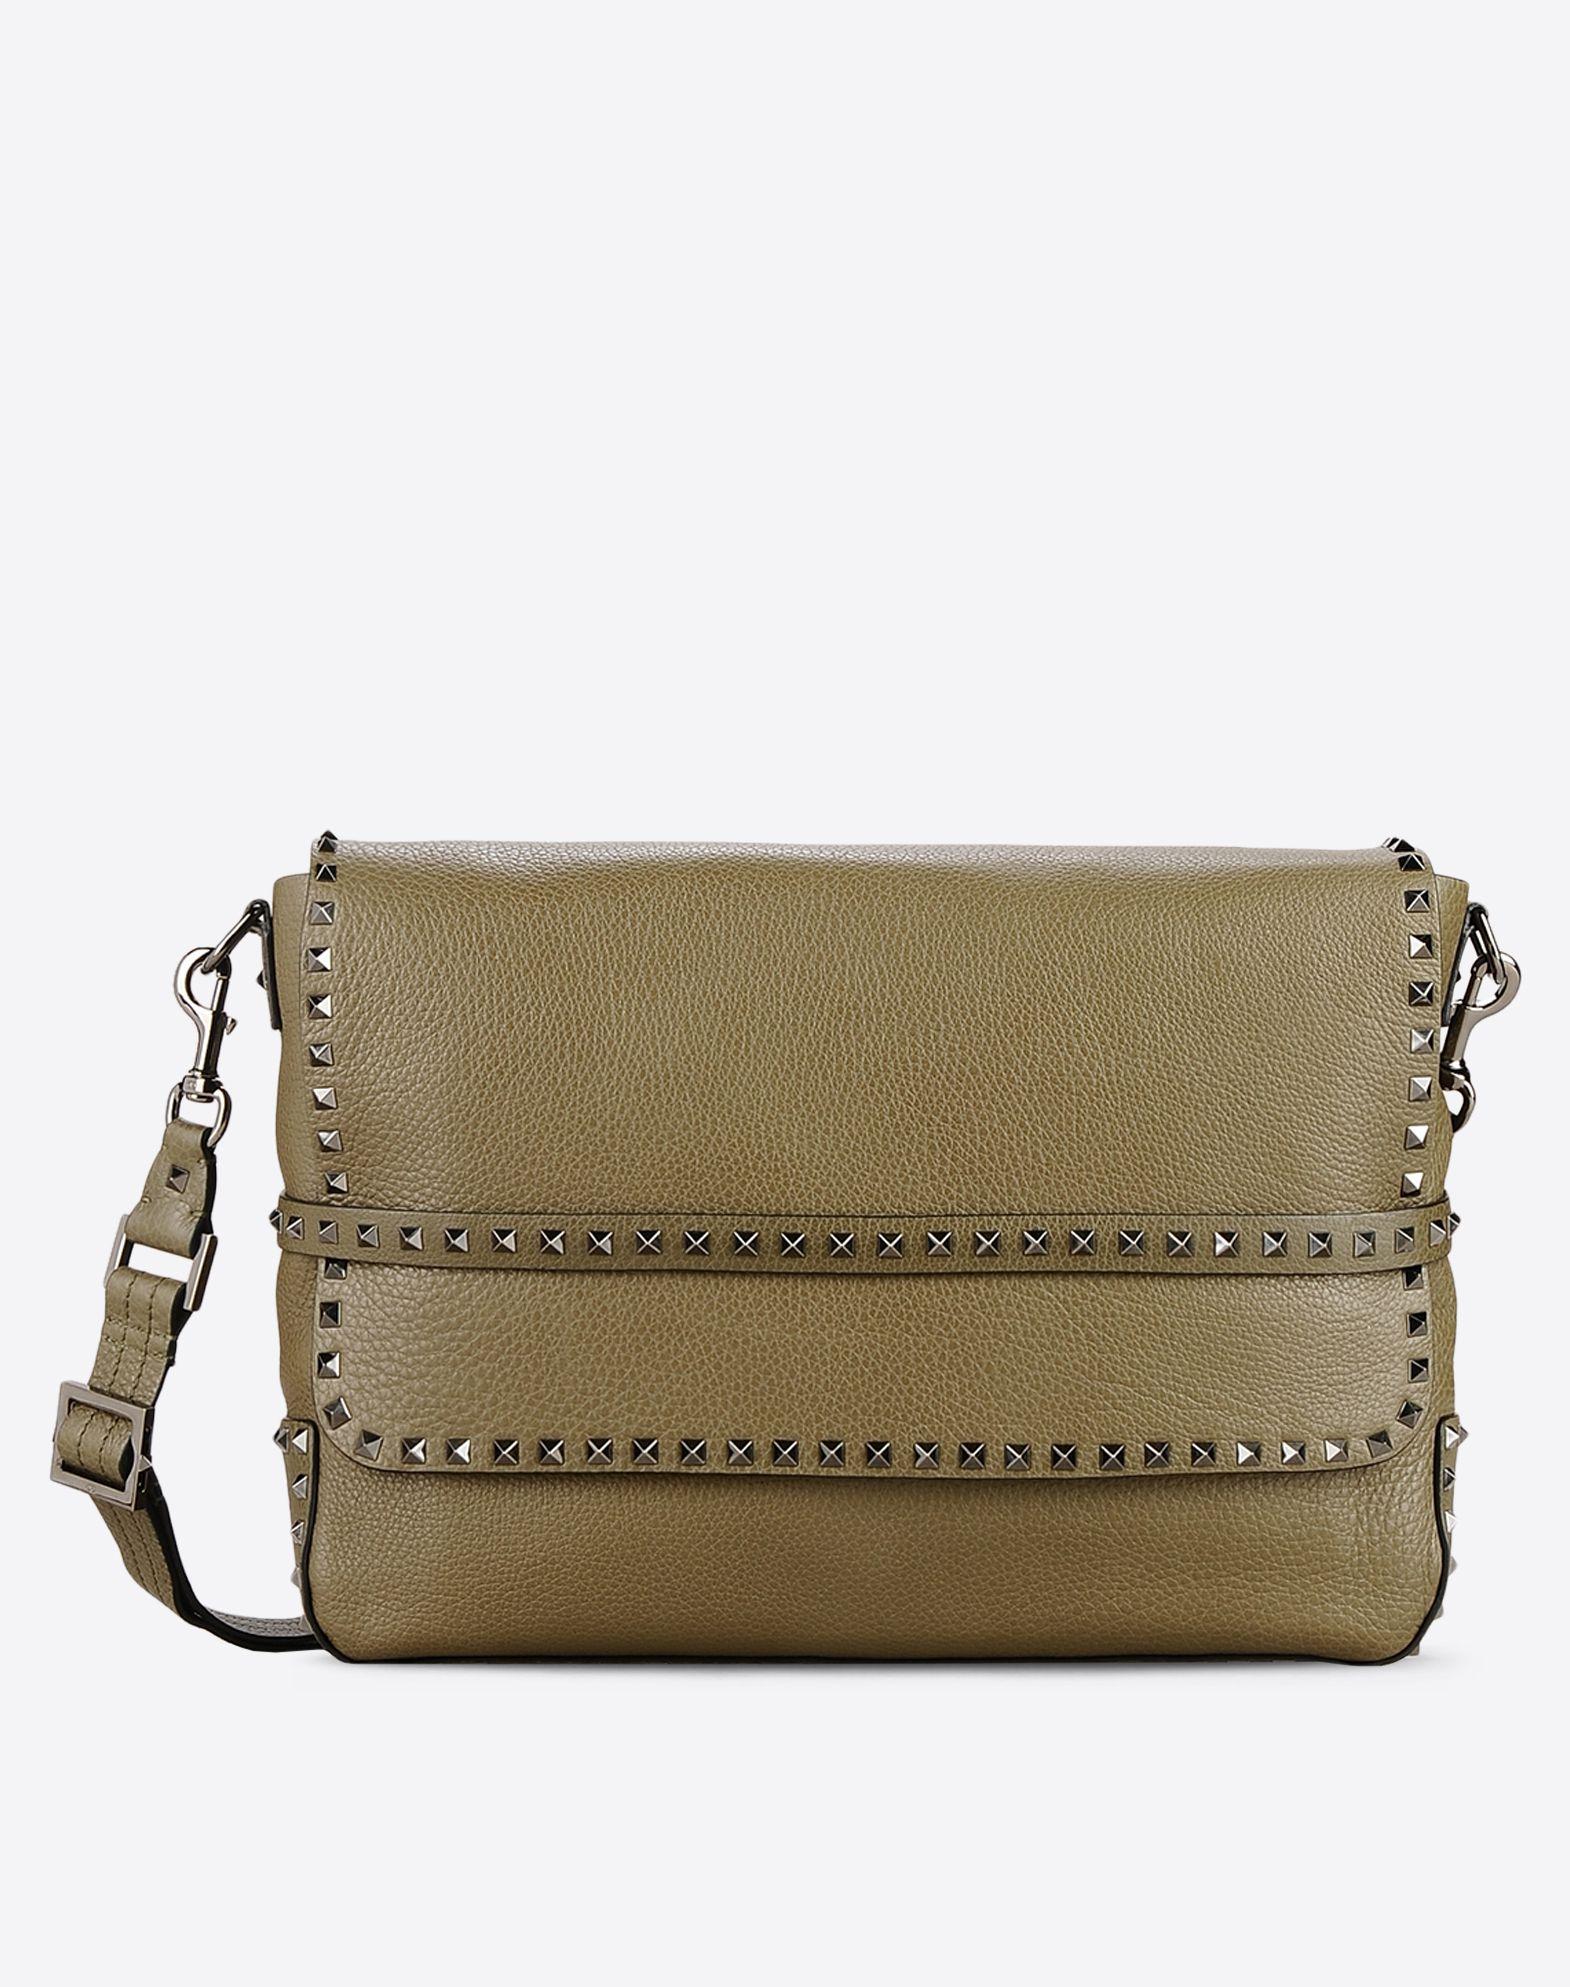 VALENTINO Textured leather Studs Logo Solid color Internal pockets Removable shoulder strap  45321745cq